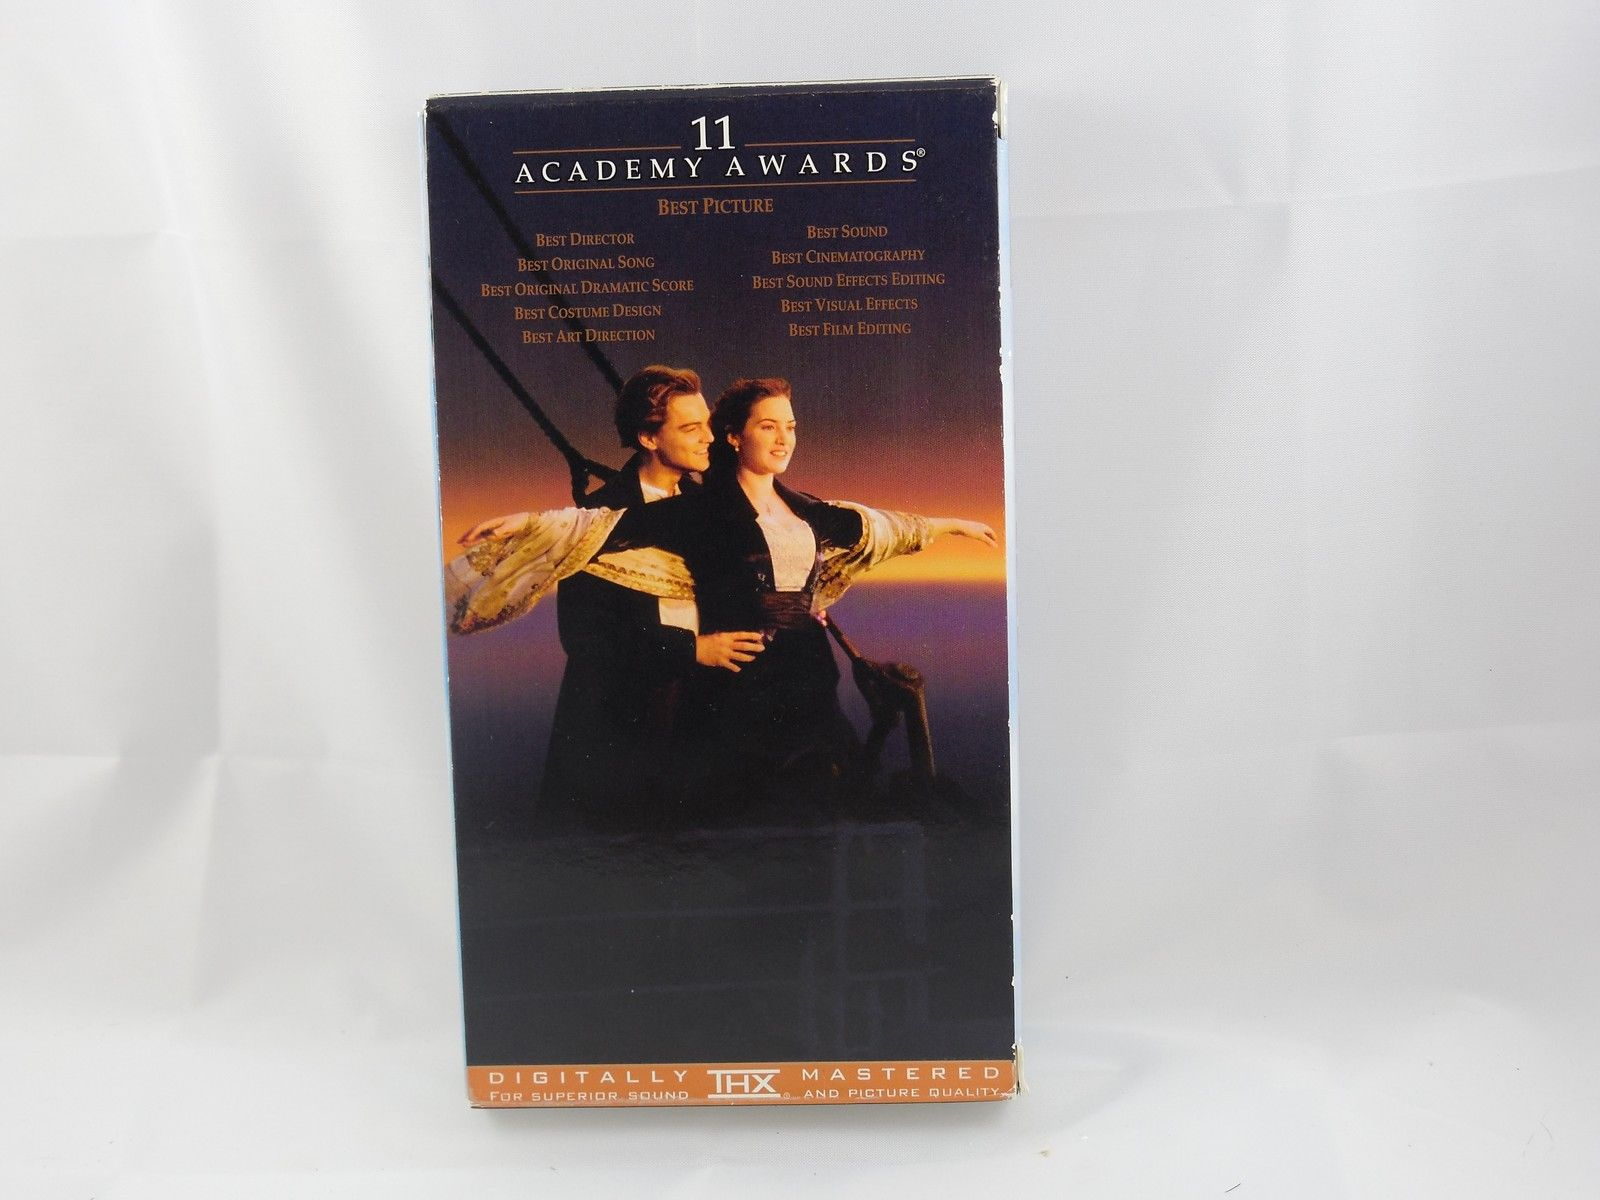 Titanic (VHS, 1998, 2-Tape Set, Pan-and-Scan) image 2